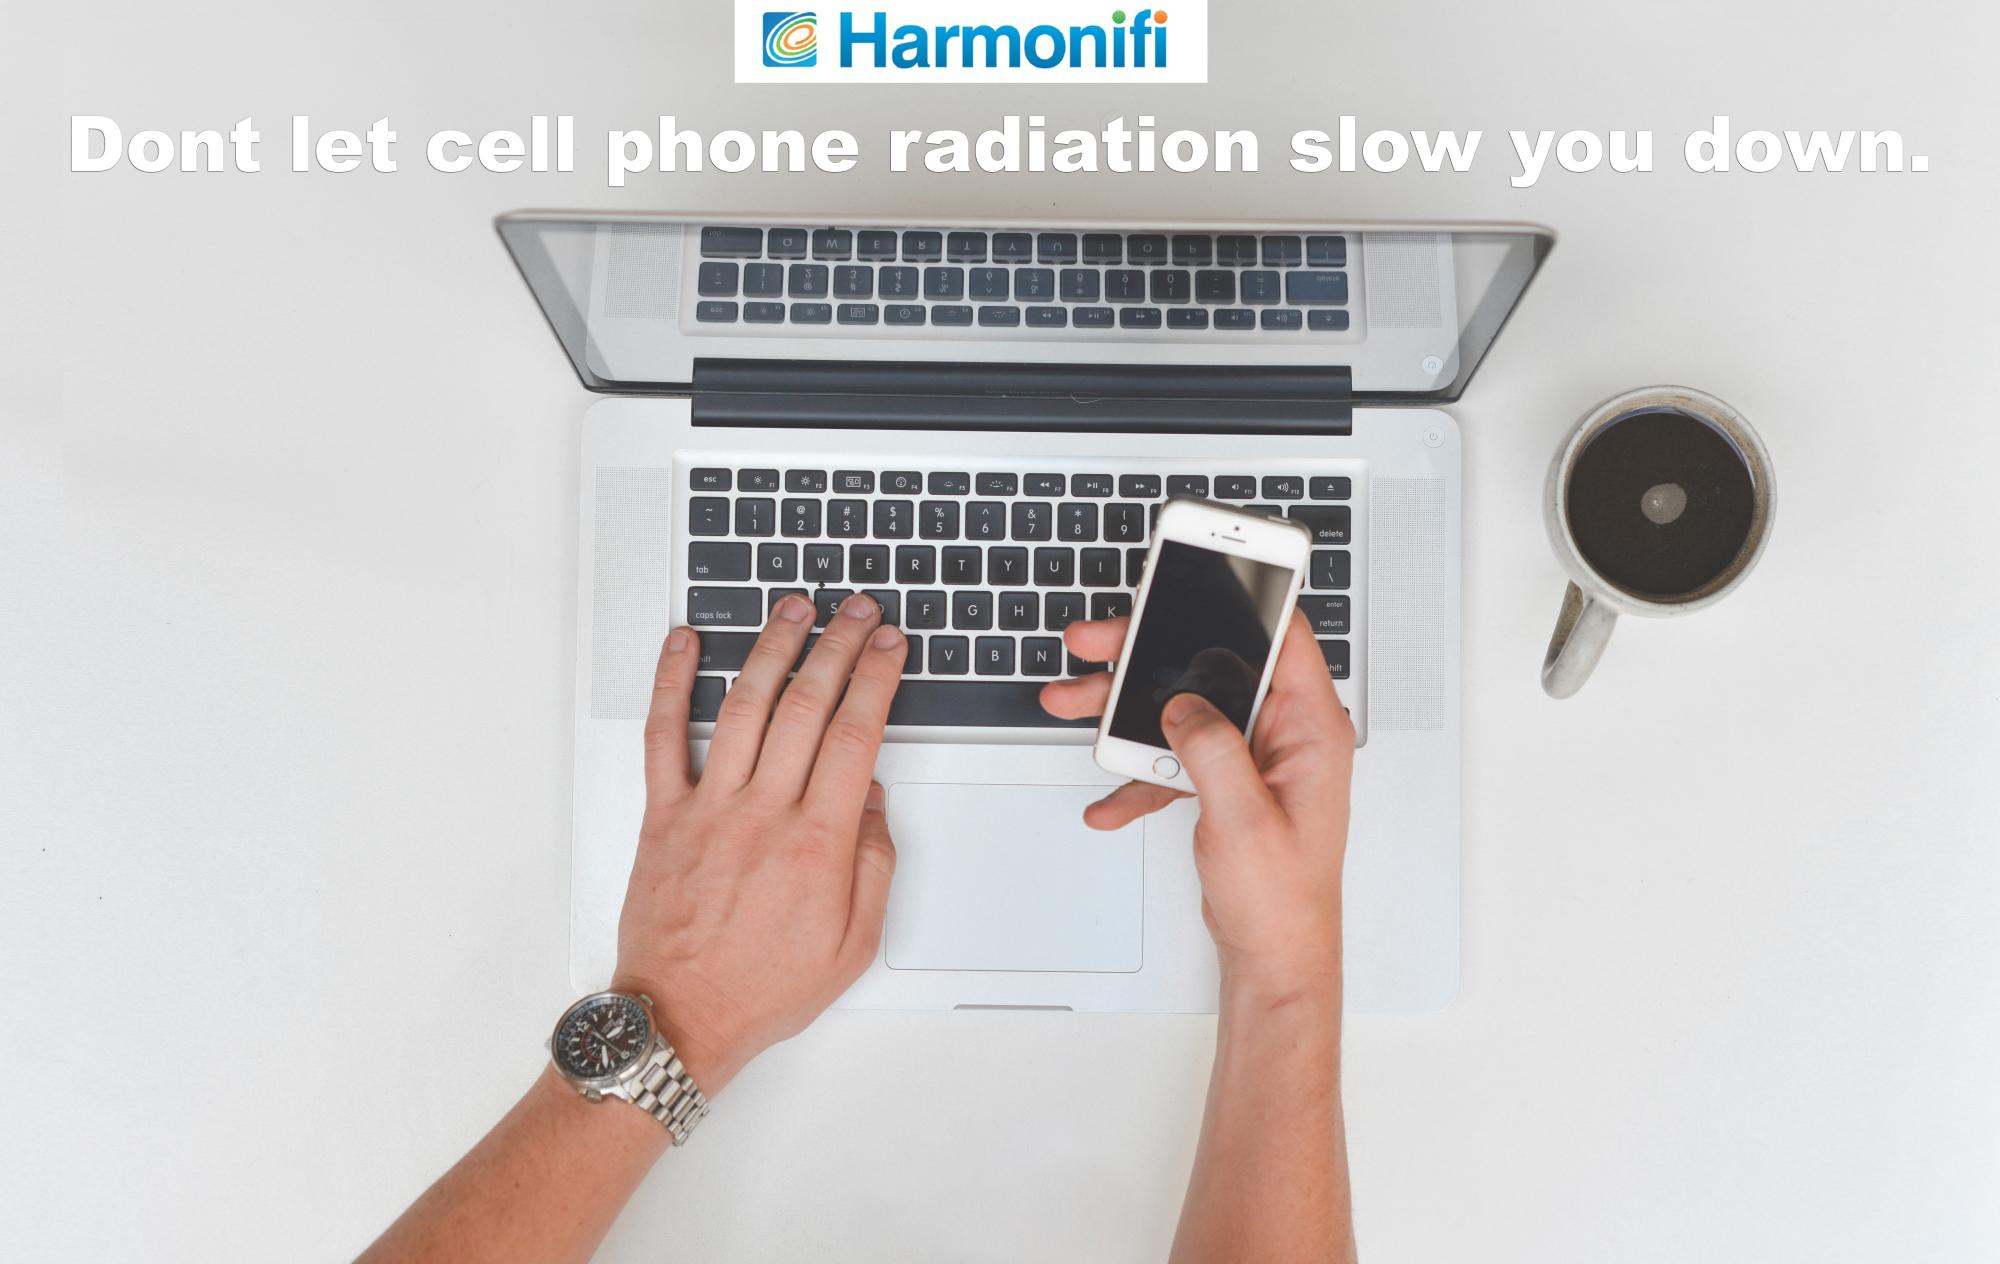 harmonifiad2